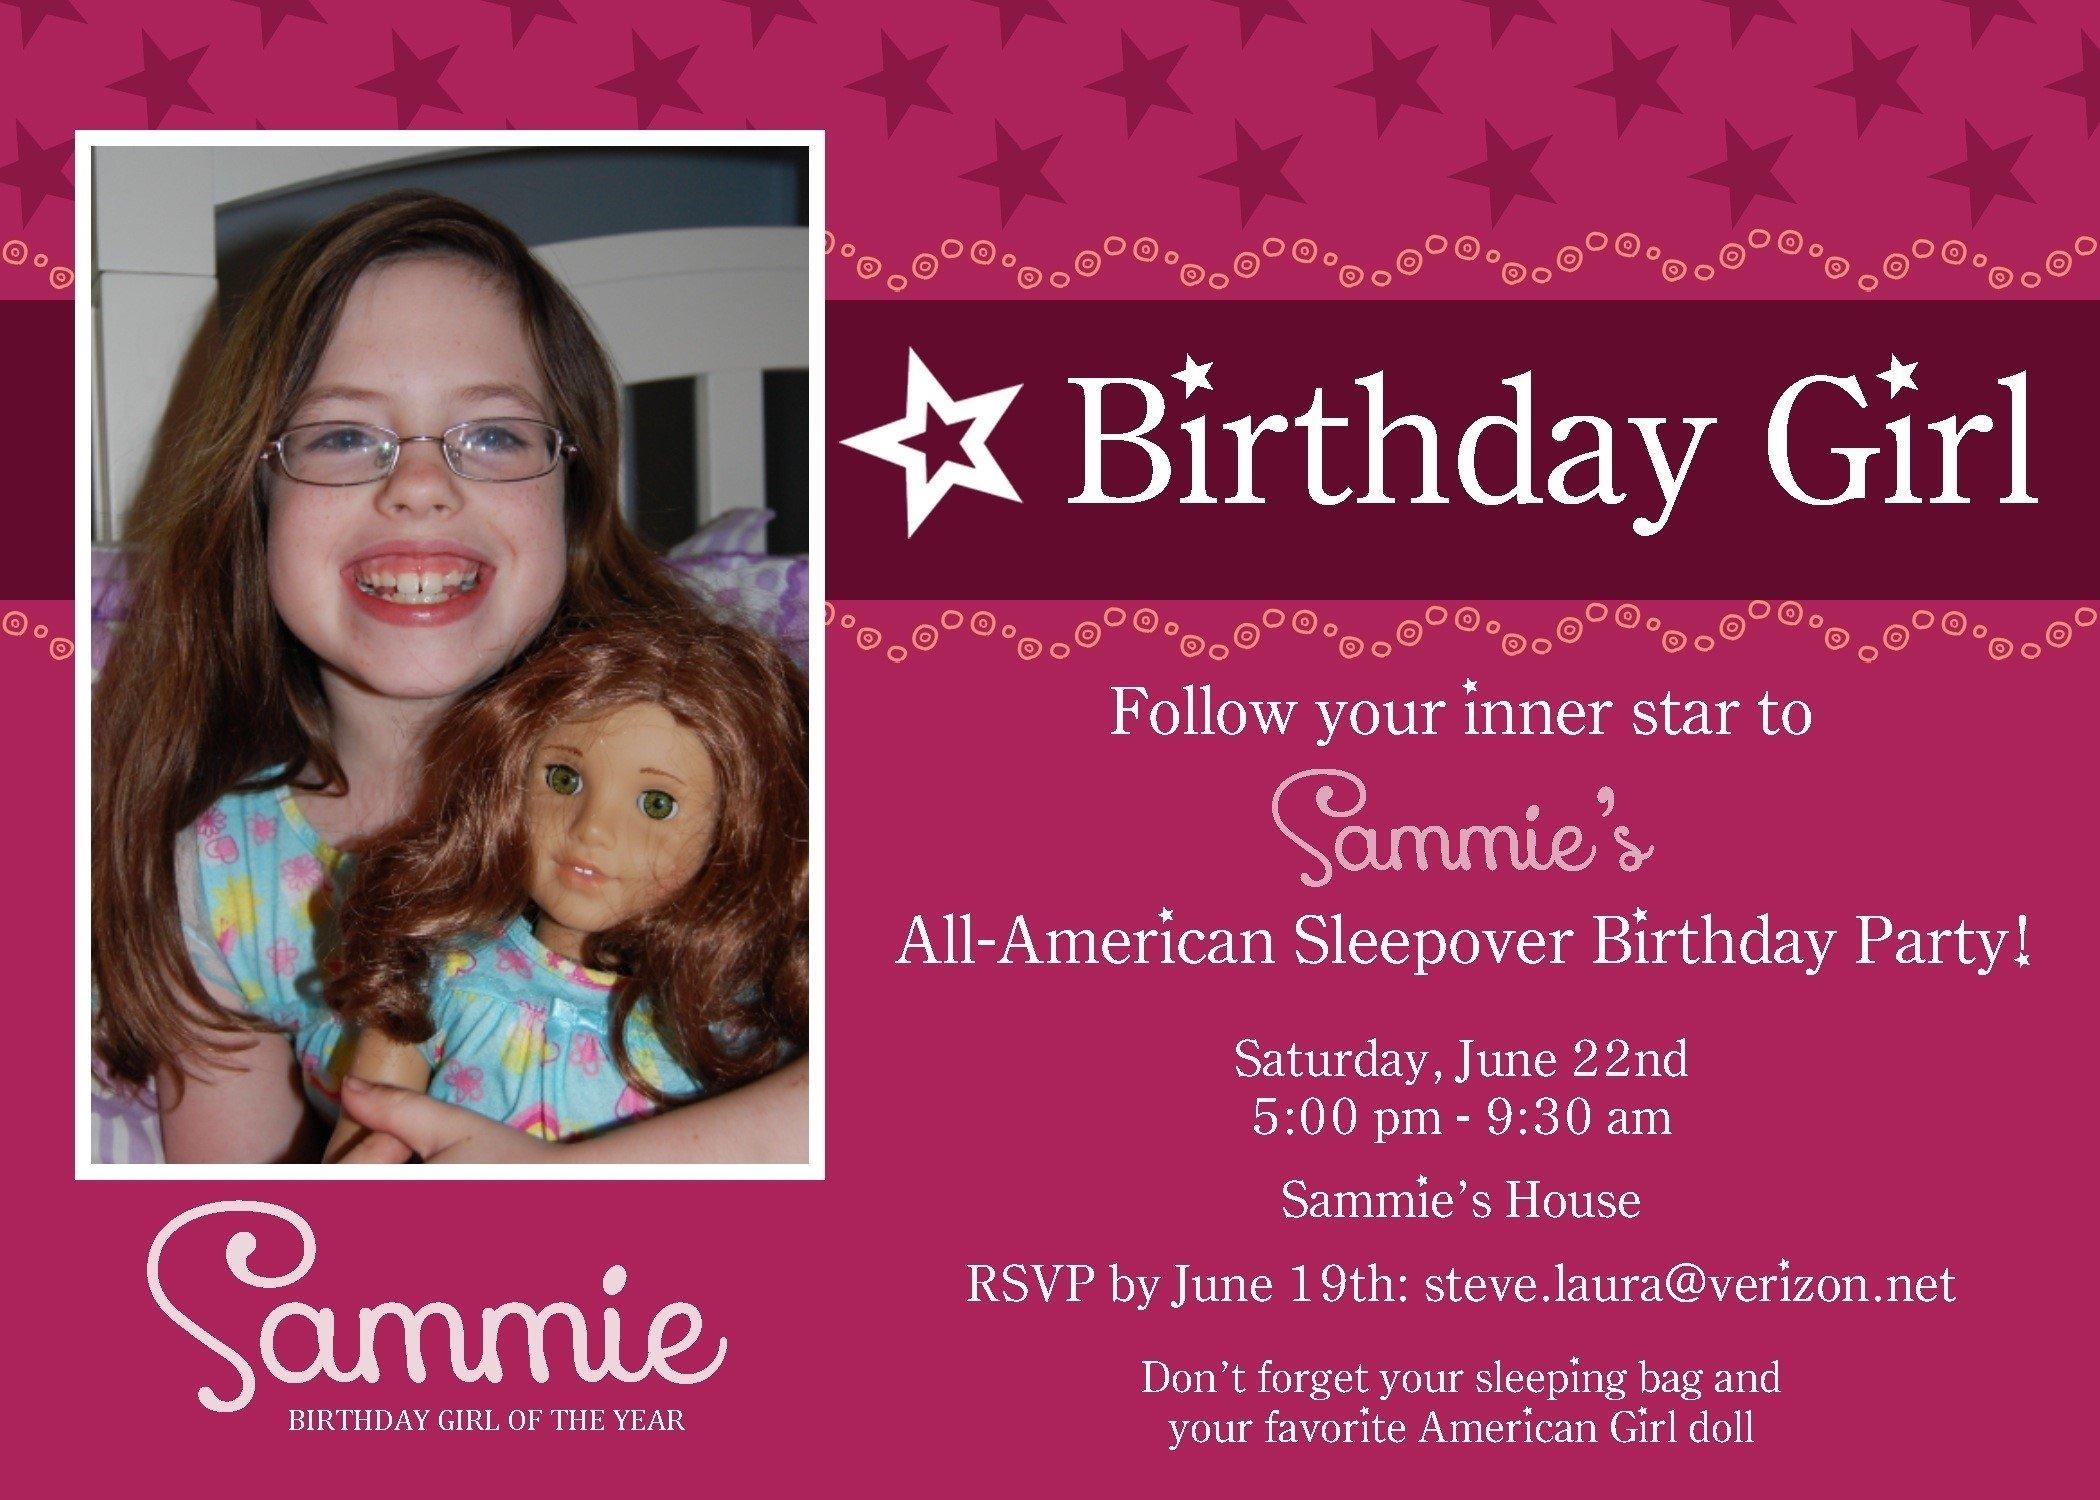 10 Great American Girl Doll Birthday Party Ideas birthday party invitations amusing american girl birthday 2020